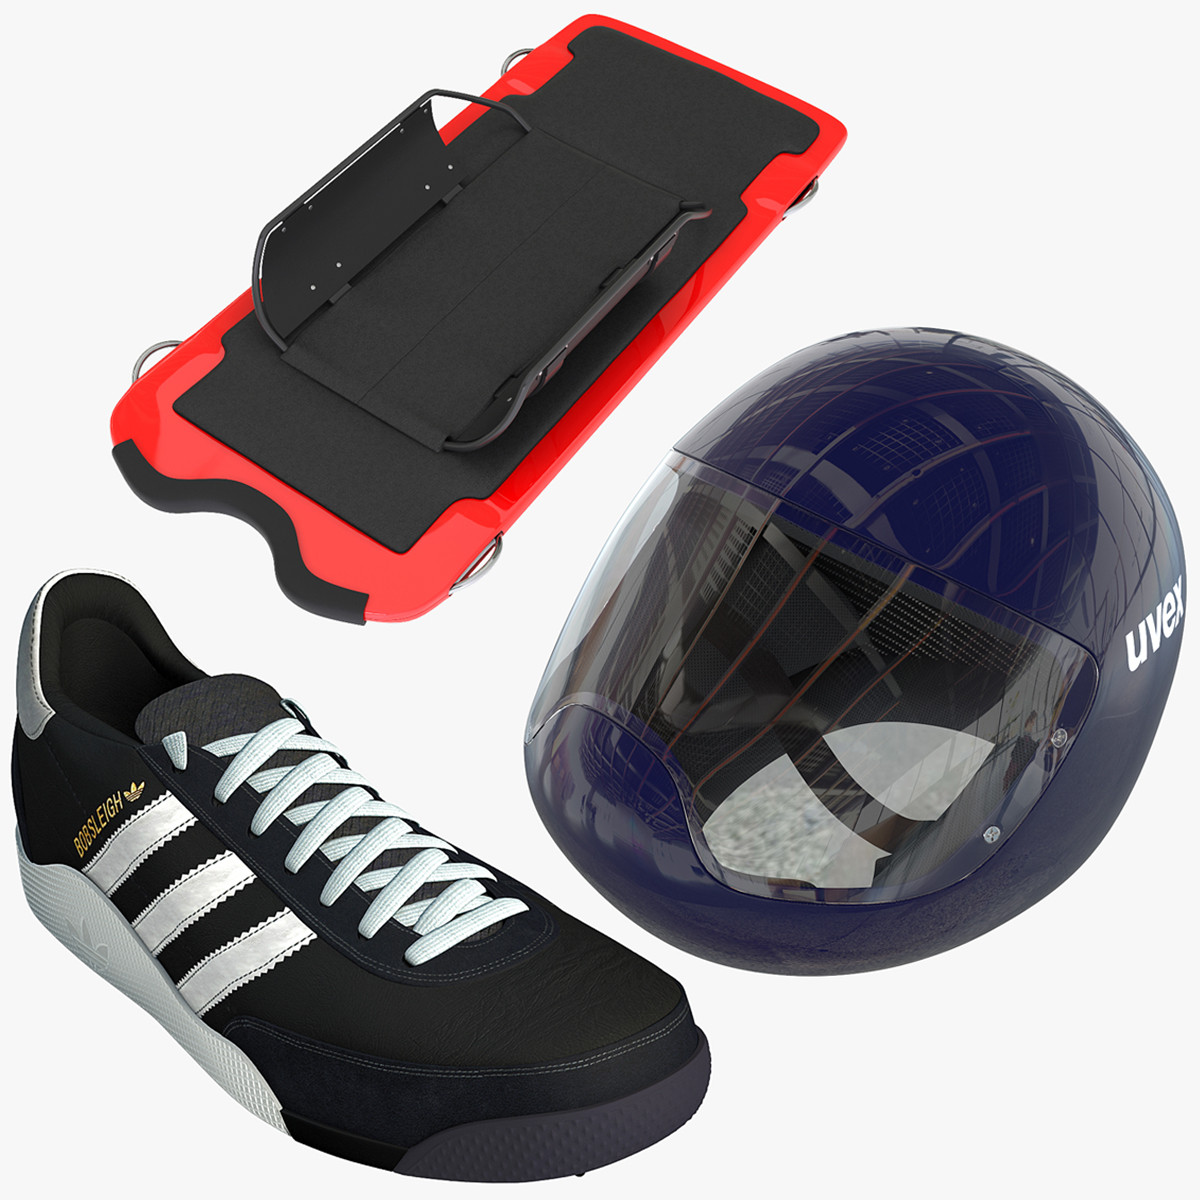 Skeleton Sled Shoes and Helmet